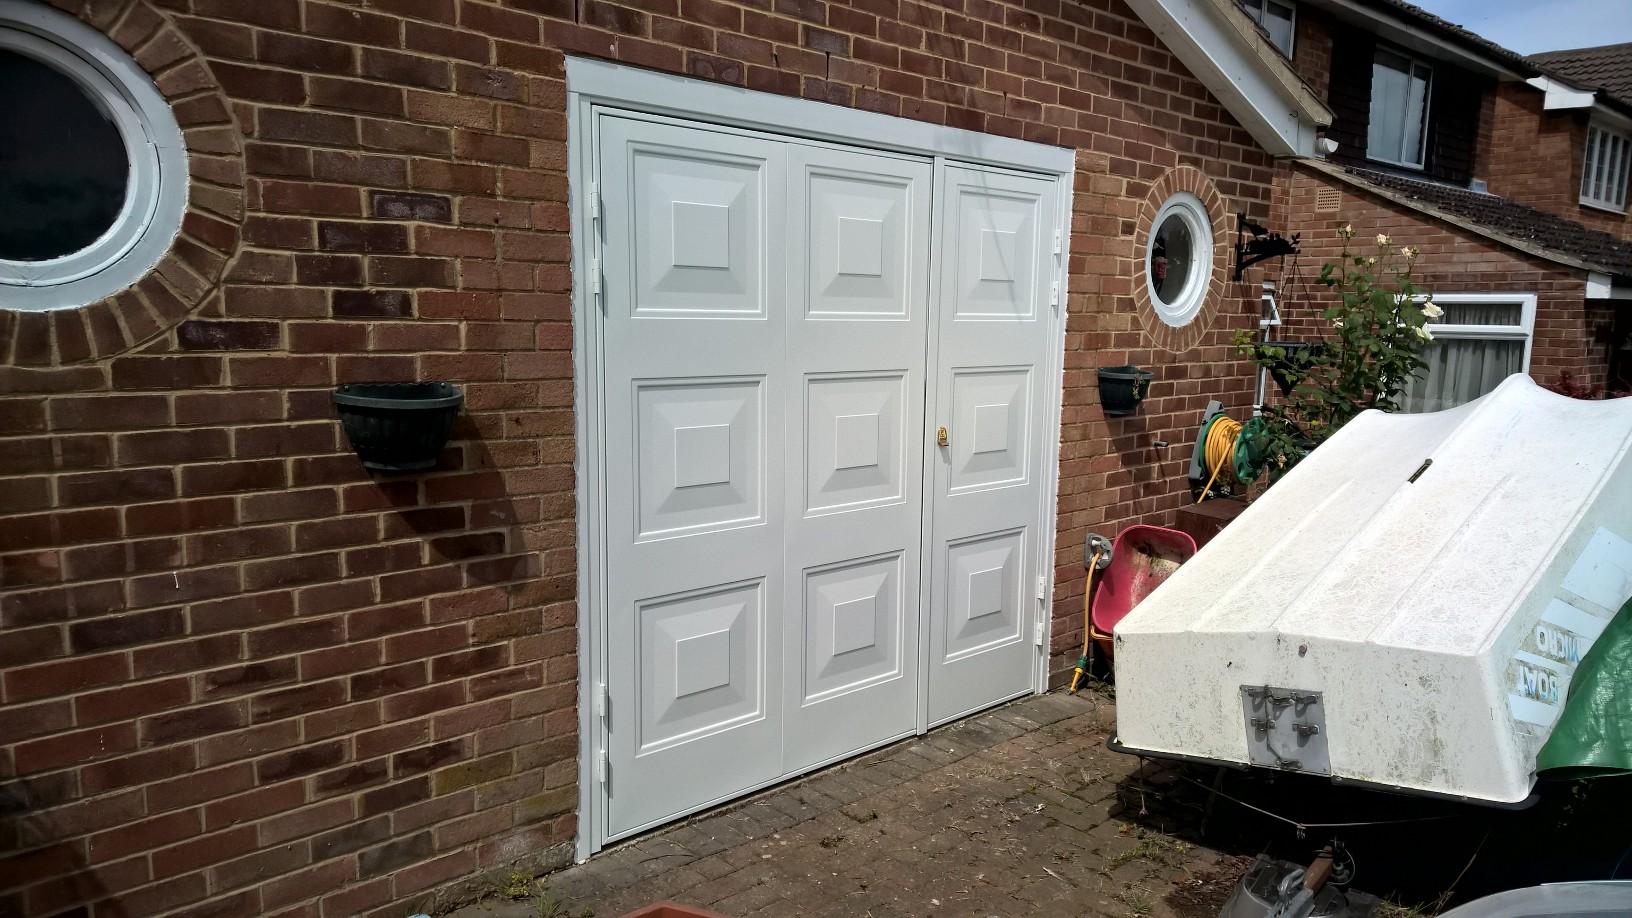 Two thirdsone third side hinged garage door in wantage elite gd georgian regent side hinged rubansaba